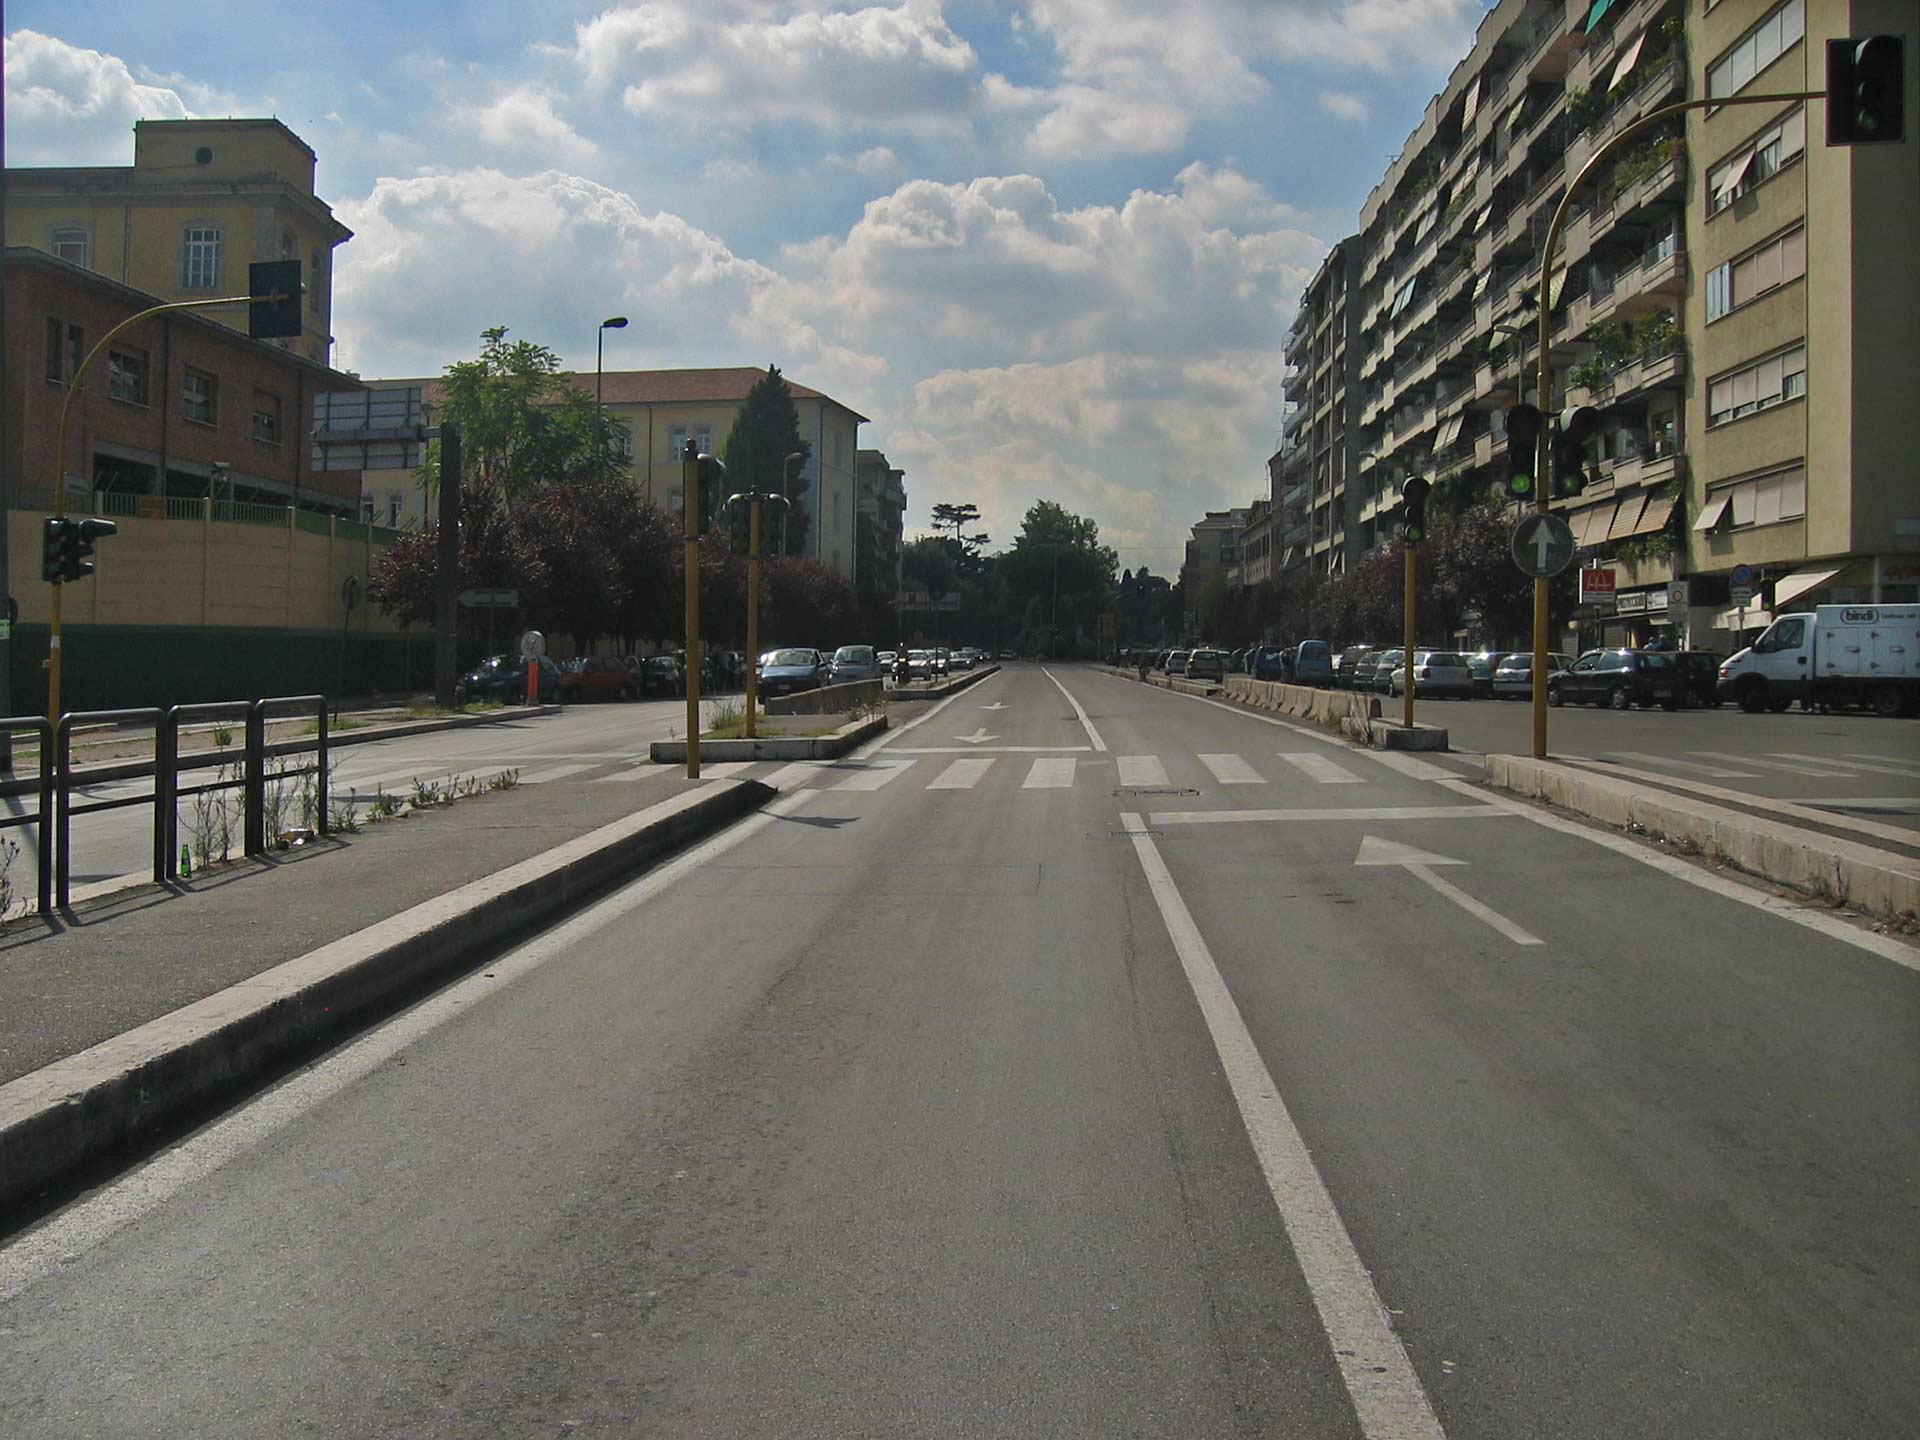 Rome, via Nomentana, Down the road blow I